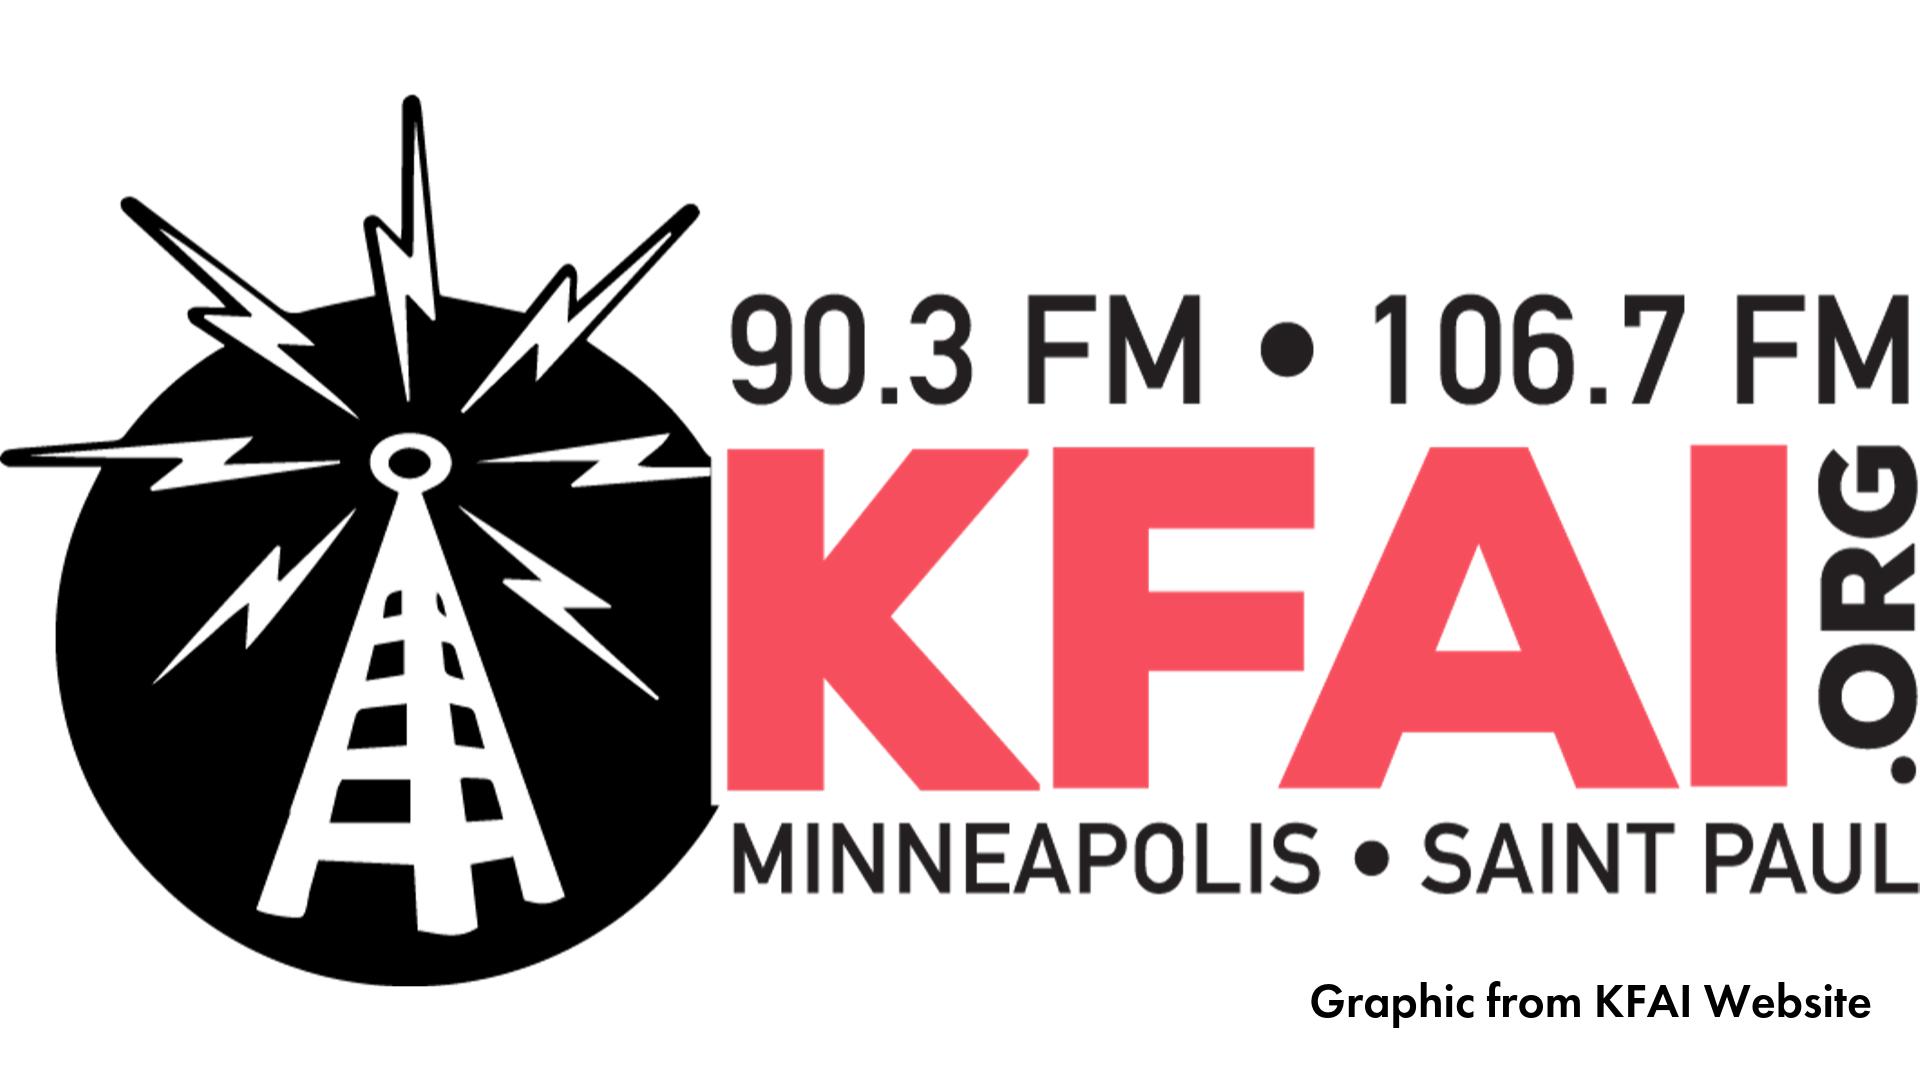 KFAI radio logo black and red graphic